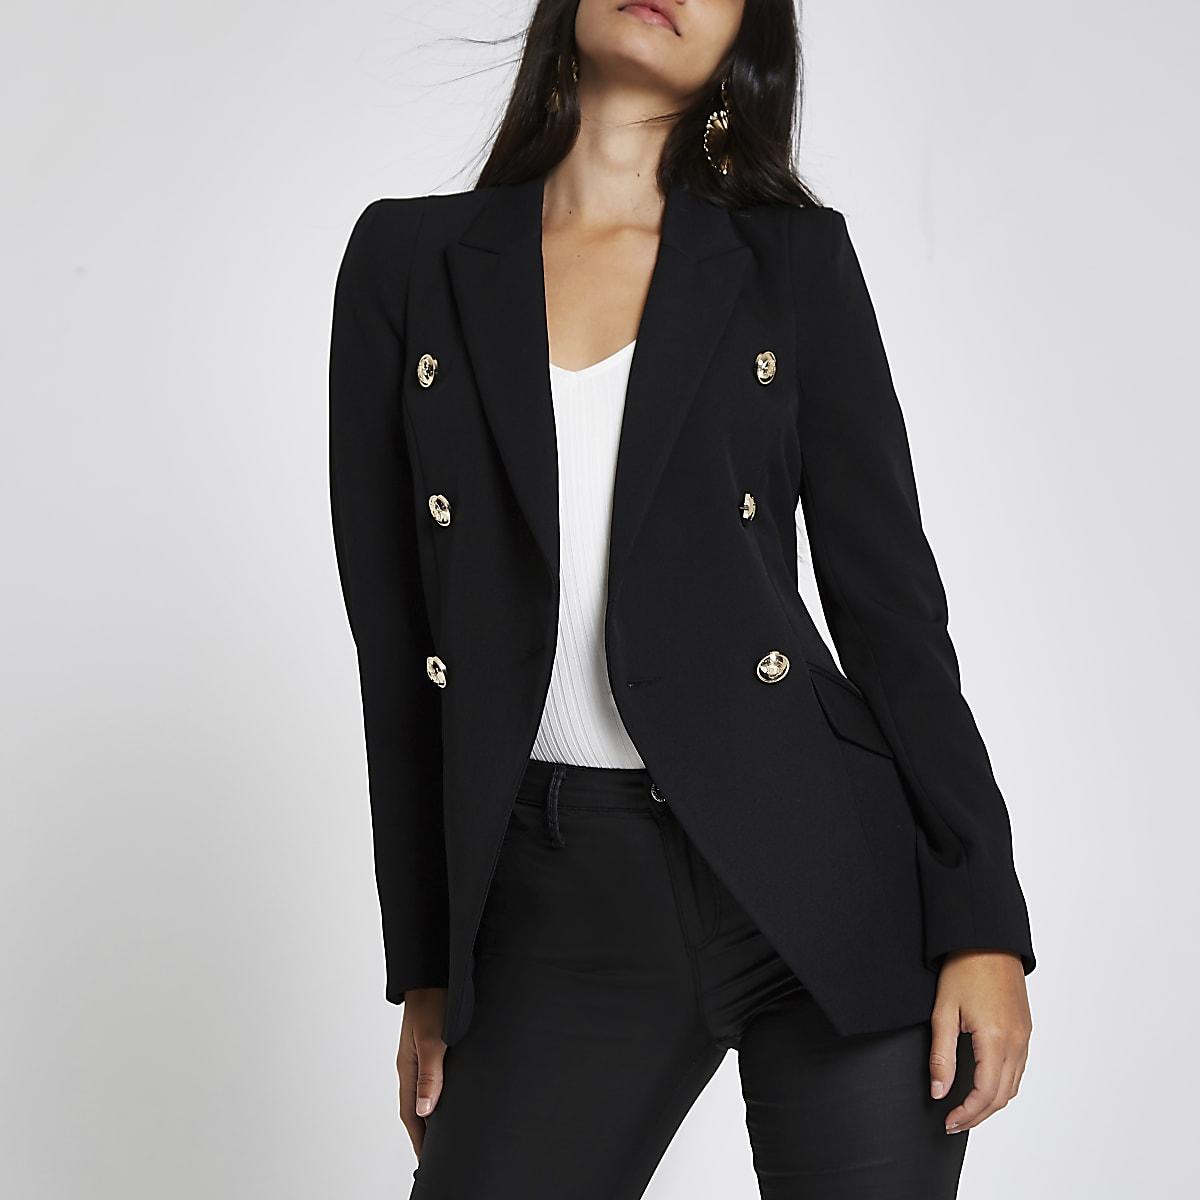 Black double breasted tux jacket